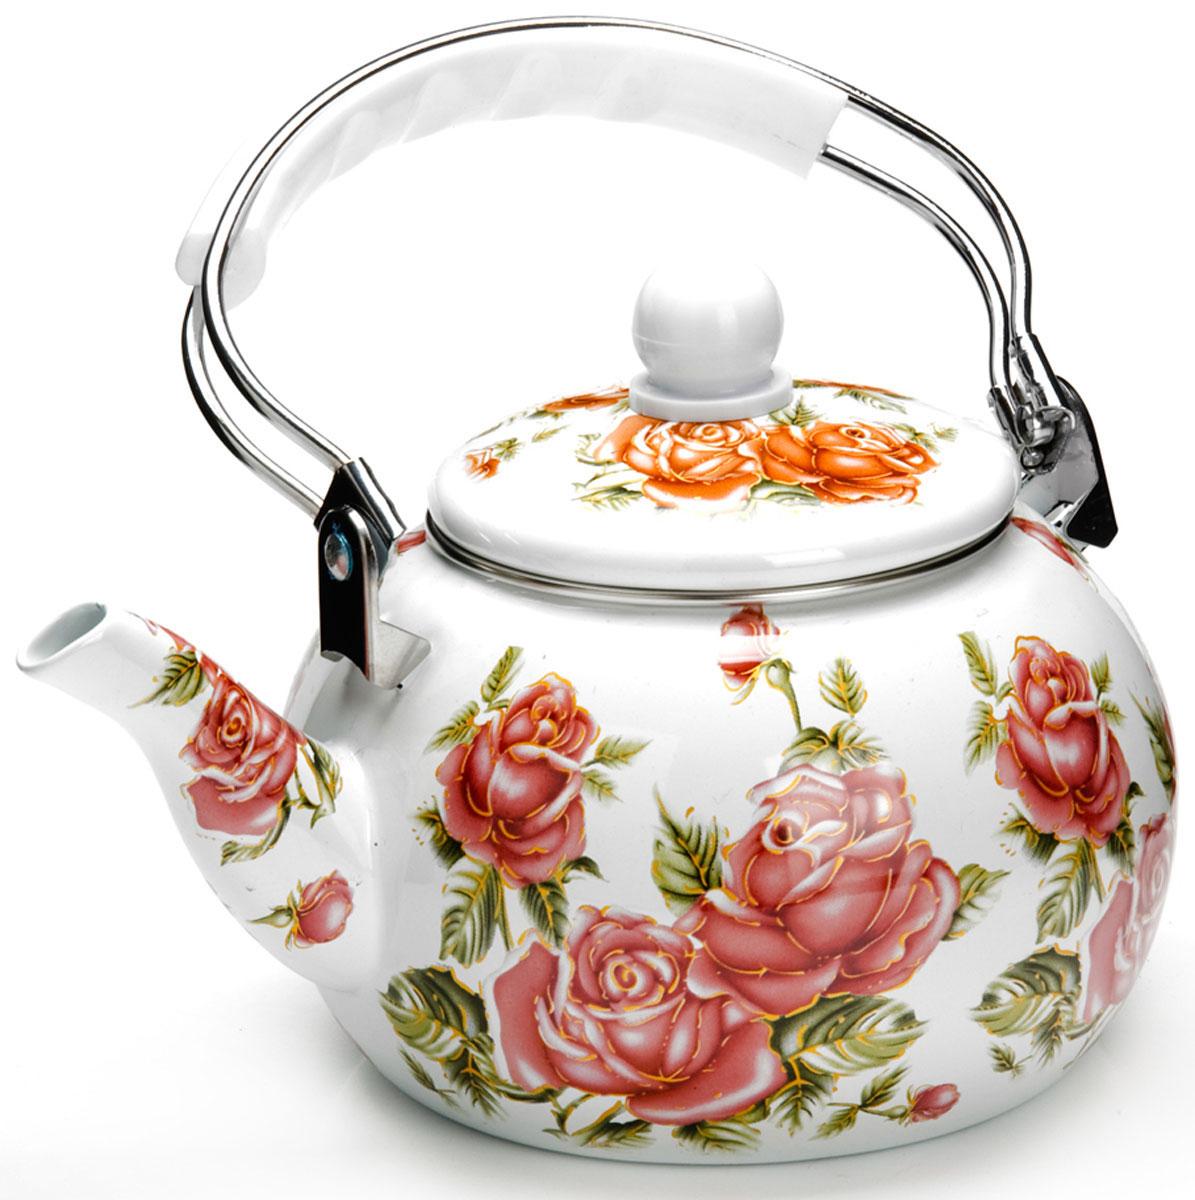 Чайник Mayer & Boch Цветы, 2,5 л. 2649126491